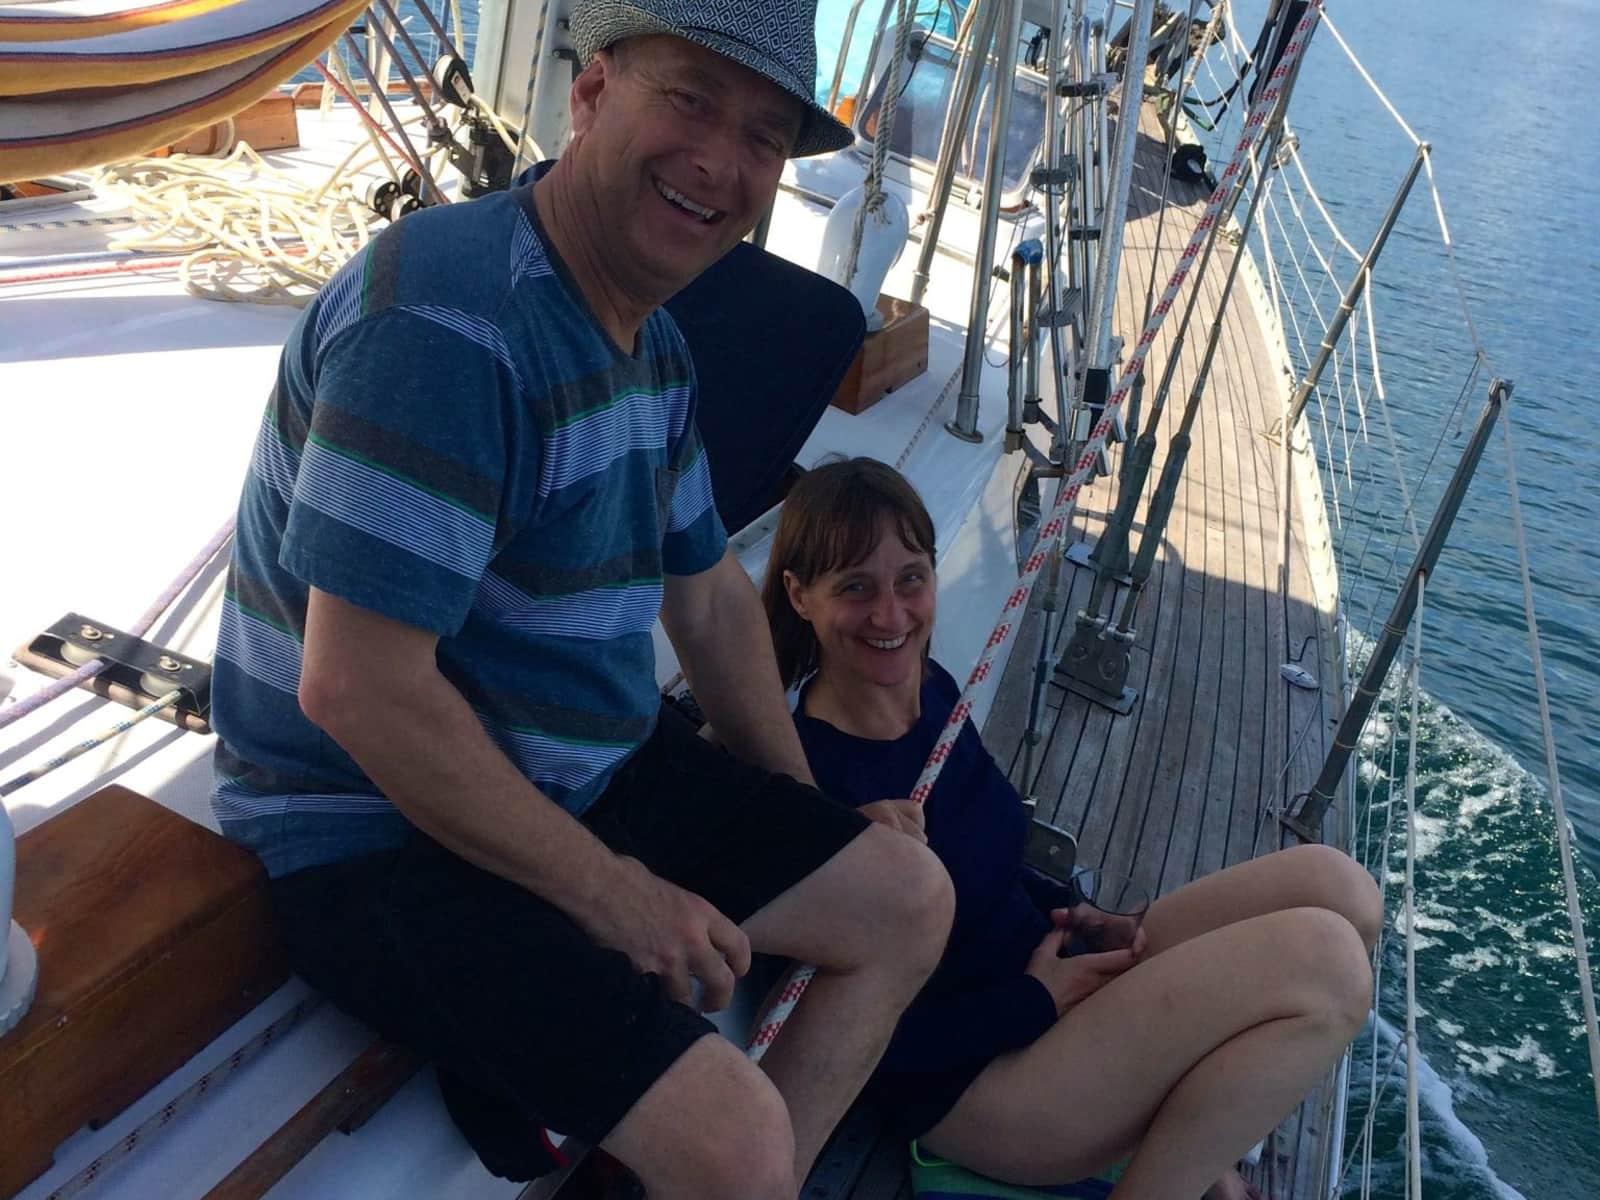 Theresa & Ken from San Francisco, California, United States